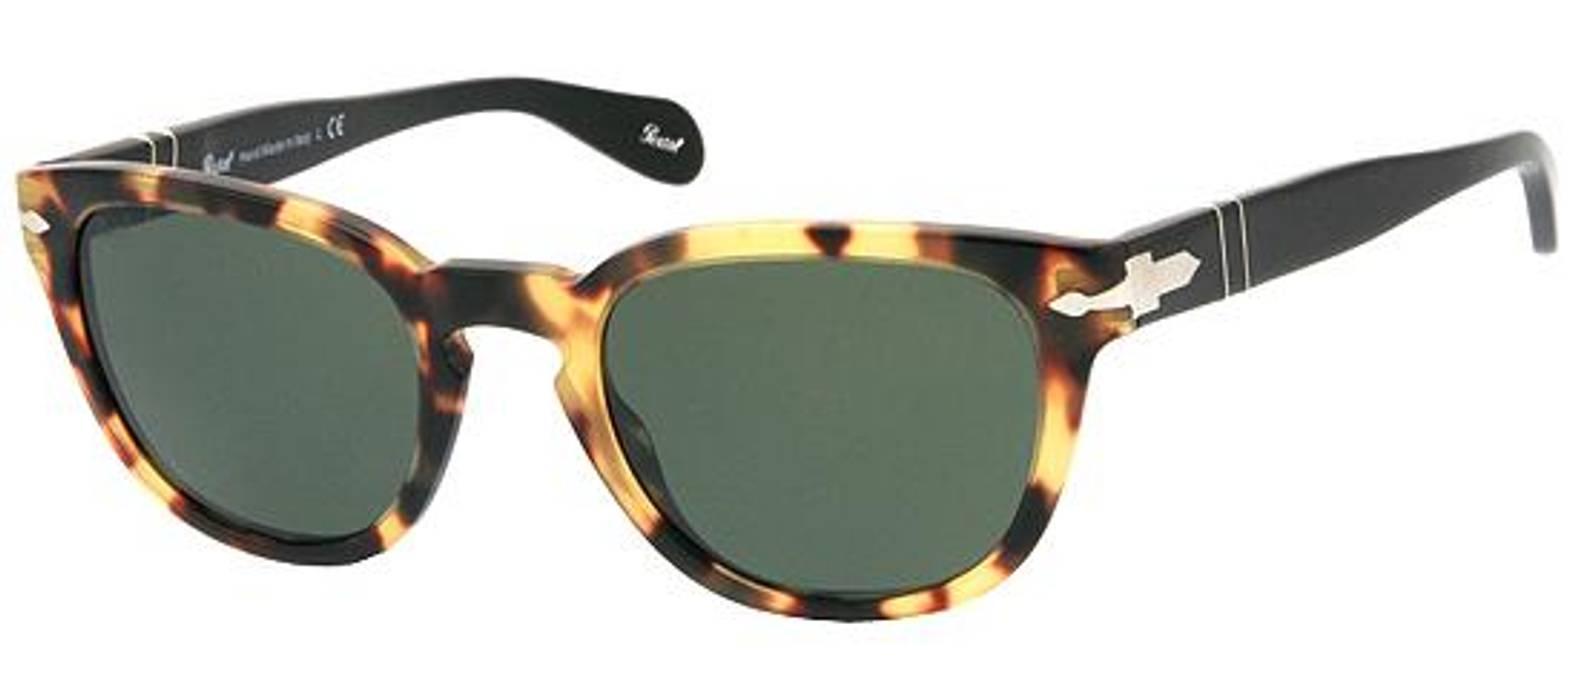 d3e0109092 Persol Havana Tortoise Shell Wayfarer Sunglasses Size one size ...